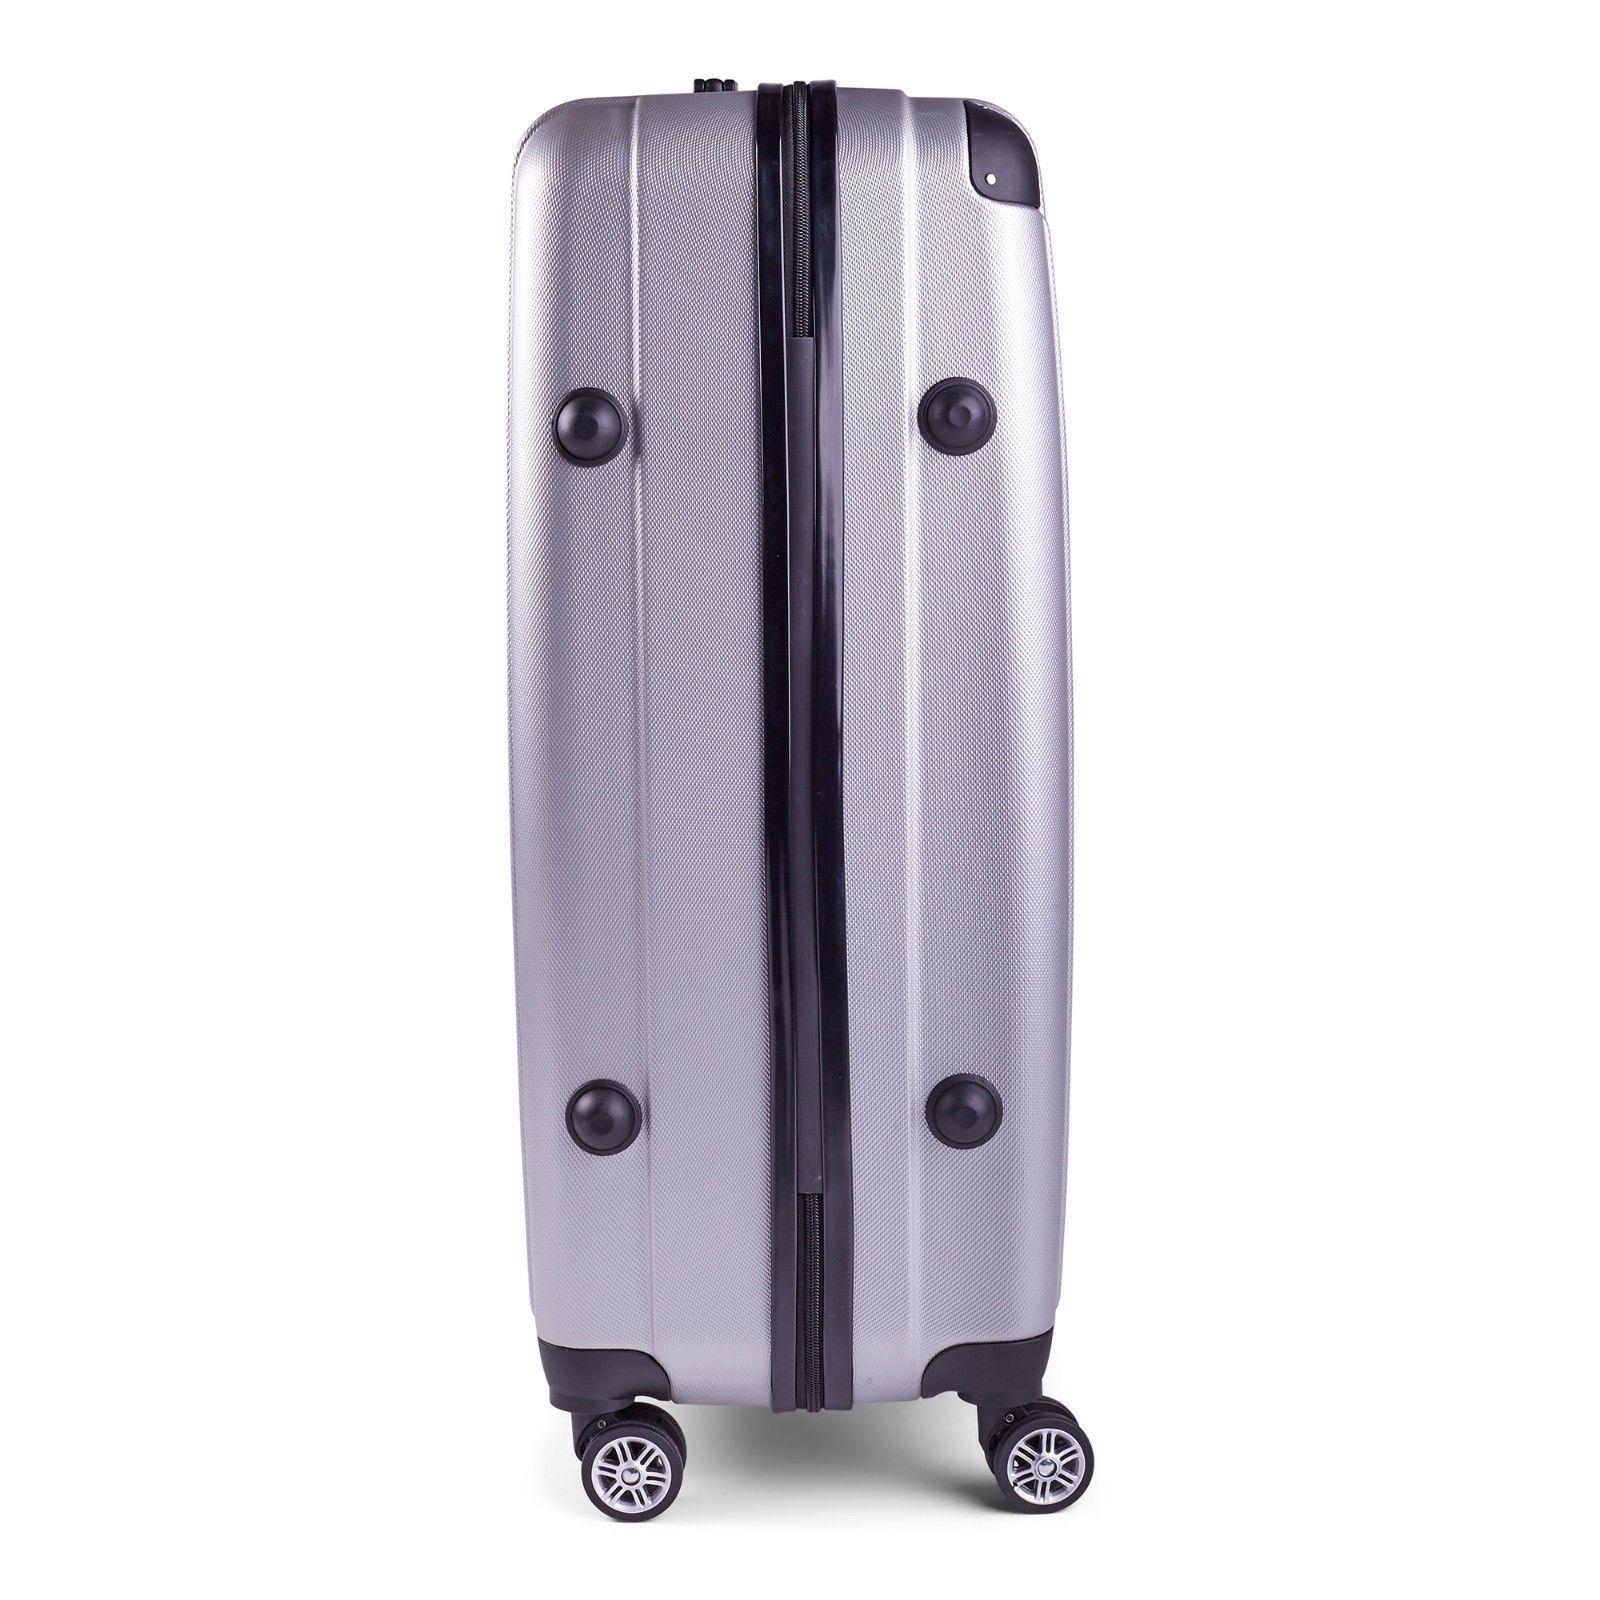 Milano-Premium-3pc-ABS-Luggage-Suitcase-Luxury-Hard-Case-Shockproof-Travel-Set thumbnail 33